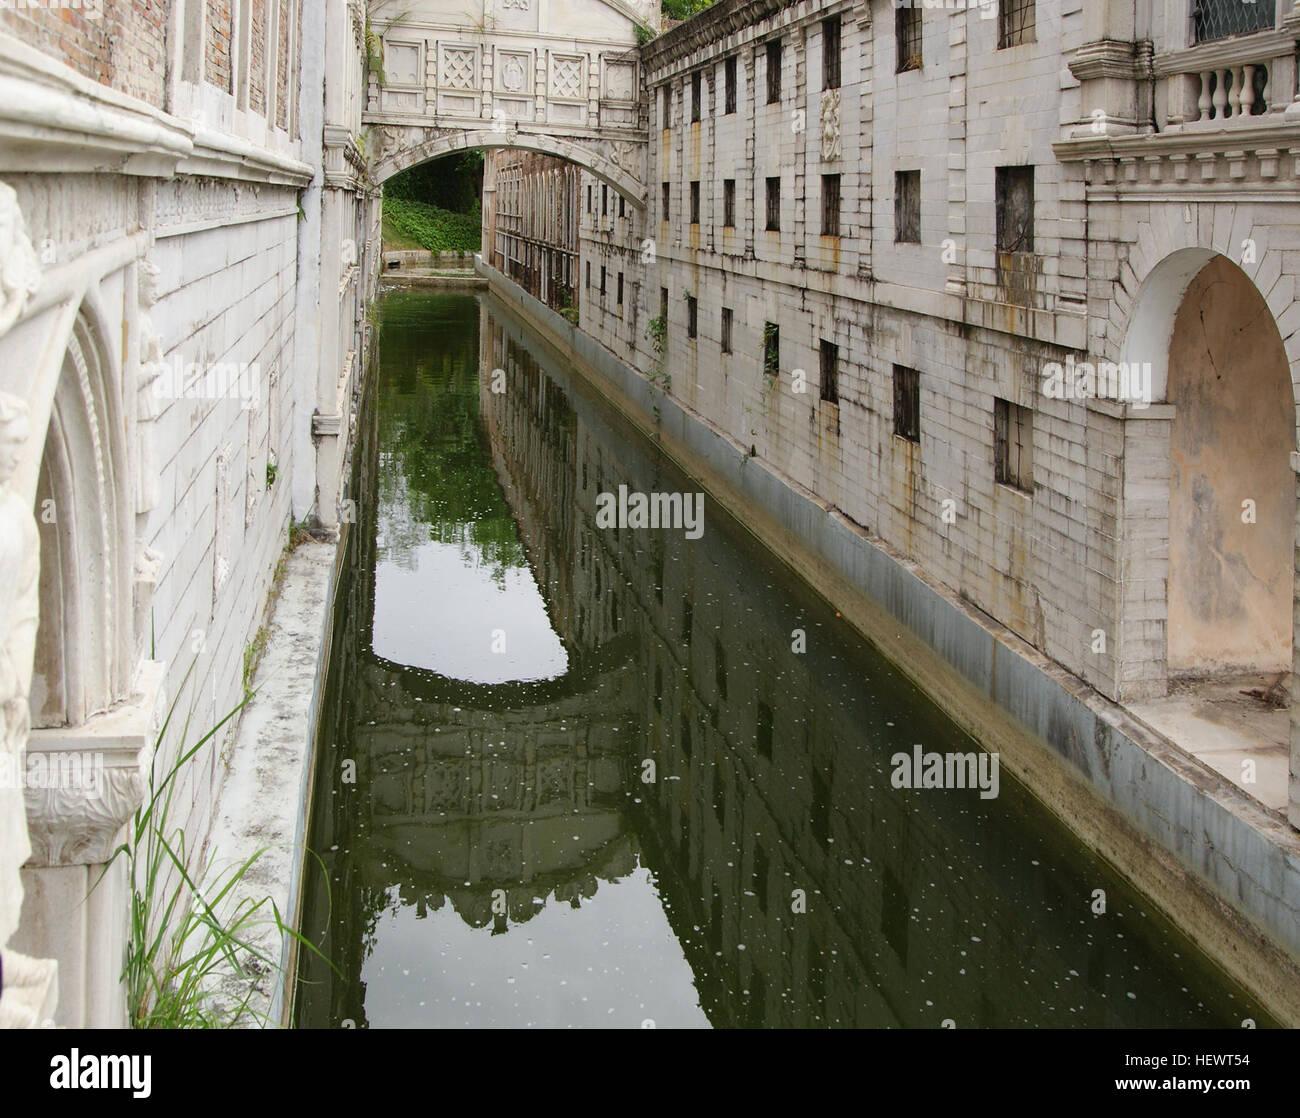 ,,China,baoan,chine,chinese,city,guangdong,street,中国,深圳 - Stock Image